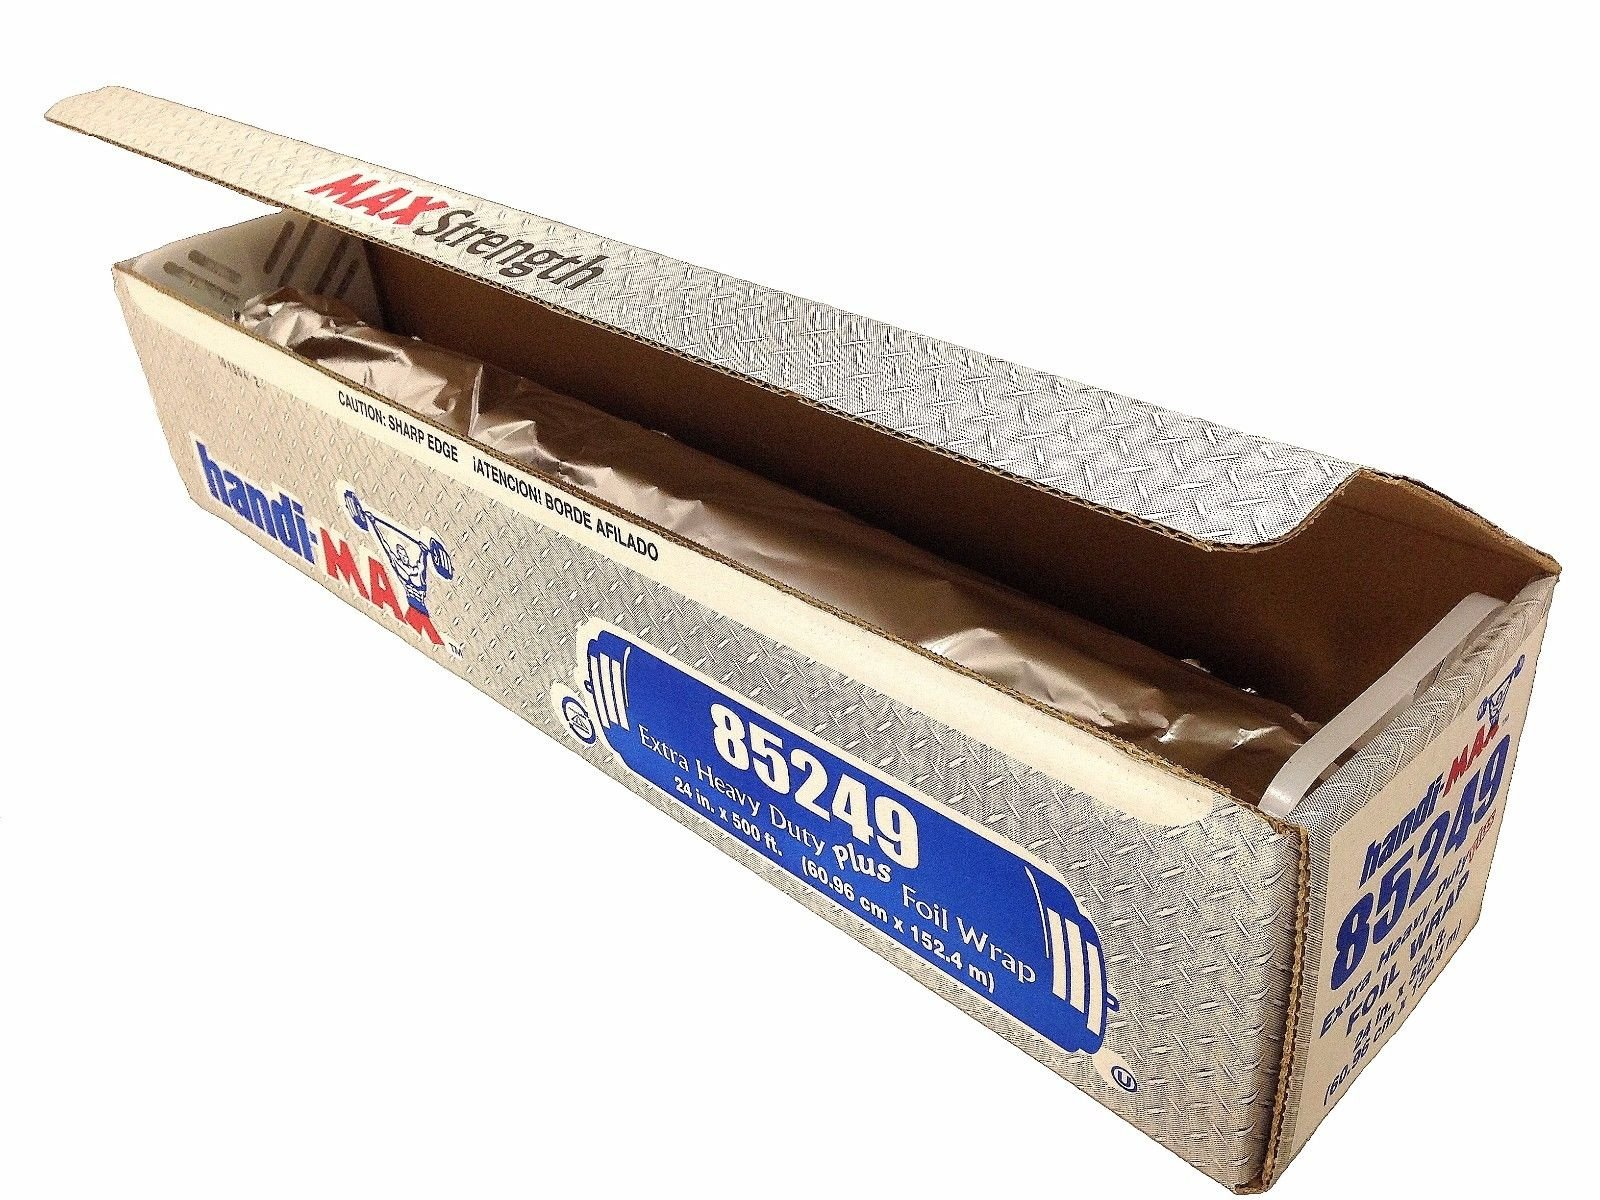 Handi-foil of America Handi-Max 24'' x 500' Extra Heavy Duty Aluminum Foil Grill Food Service Wrap (Pack of 1 Roll) by Handi-Foil